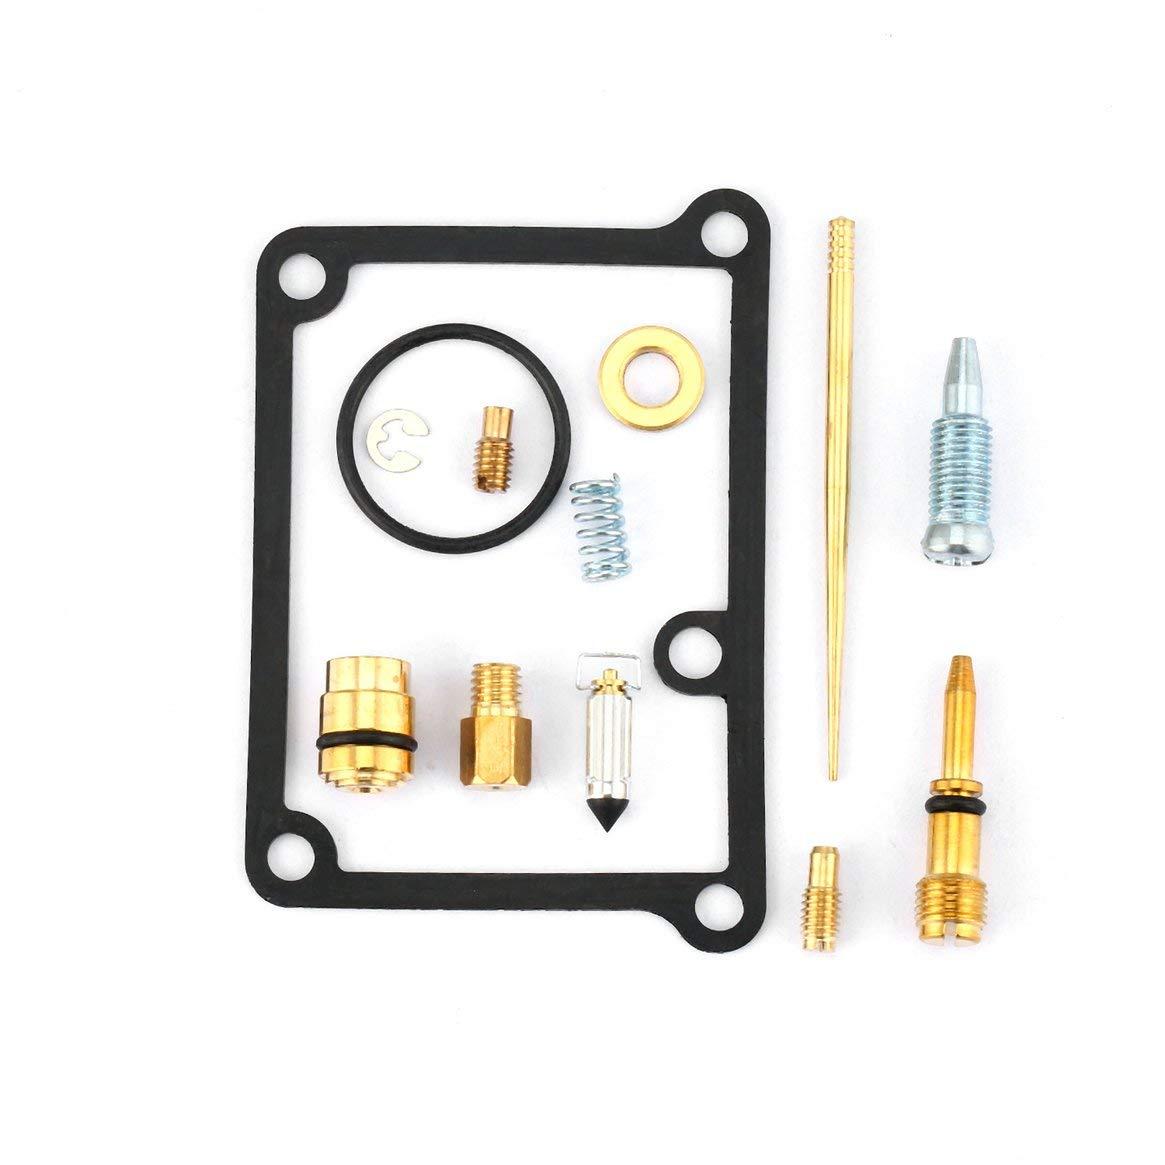 Wildlead Fuel Line kit carburatore carb per Stihl FS38/FS45/FS55/decespugliatore Weed Eater